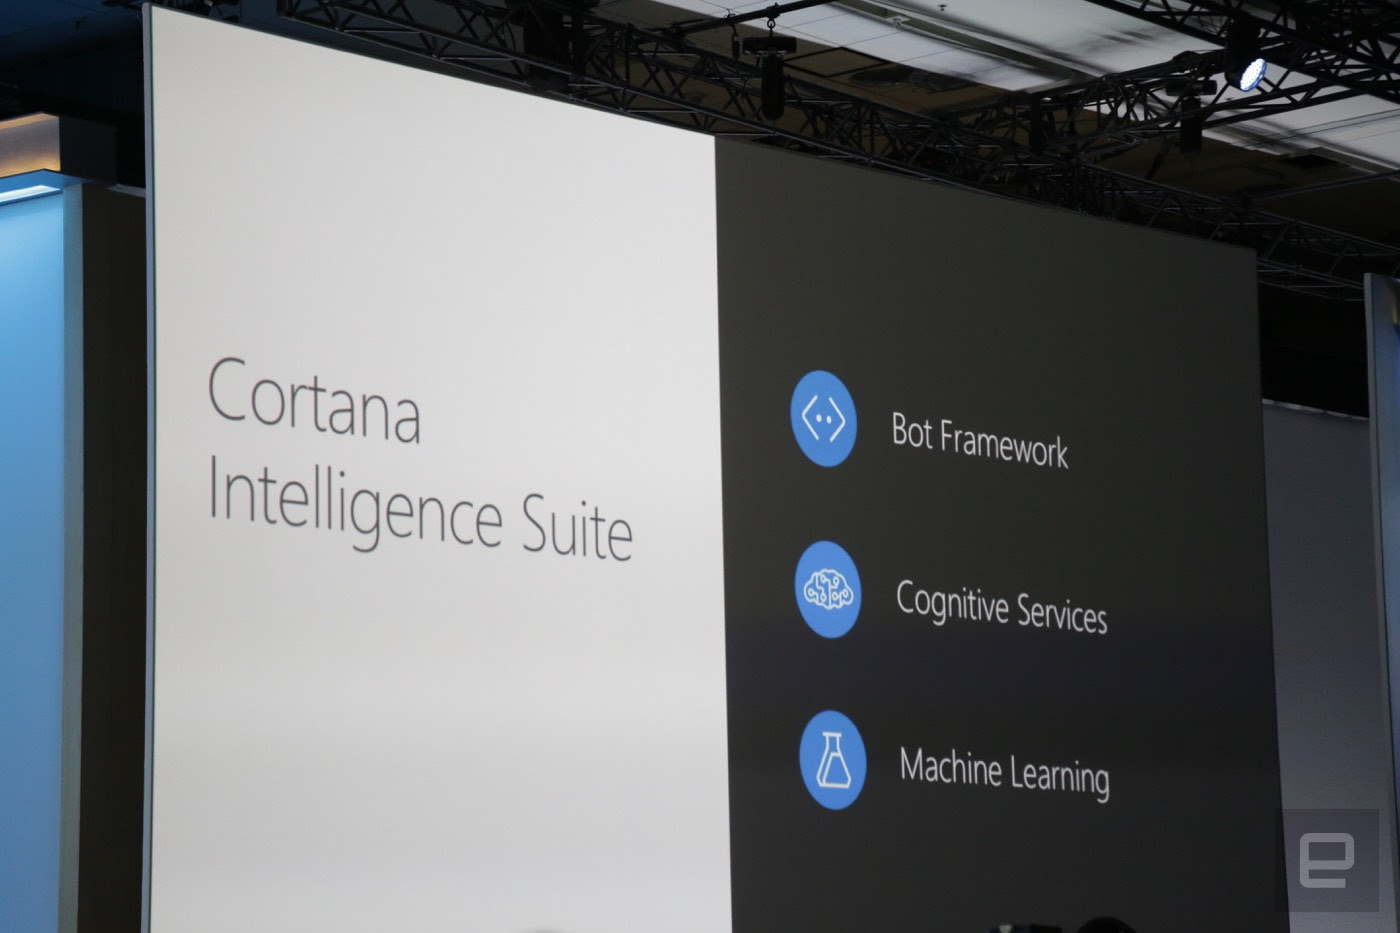 Cortana Intelligence Suite